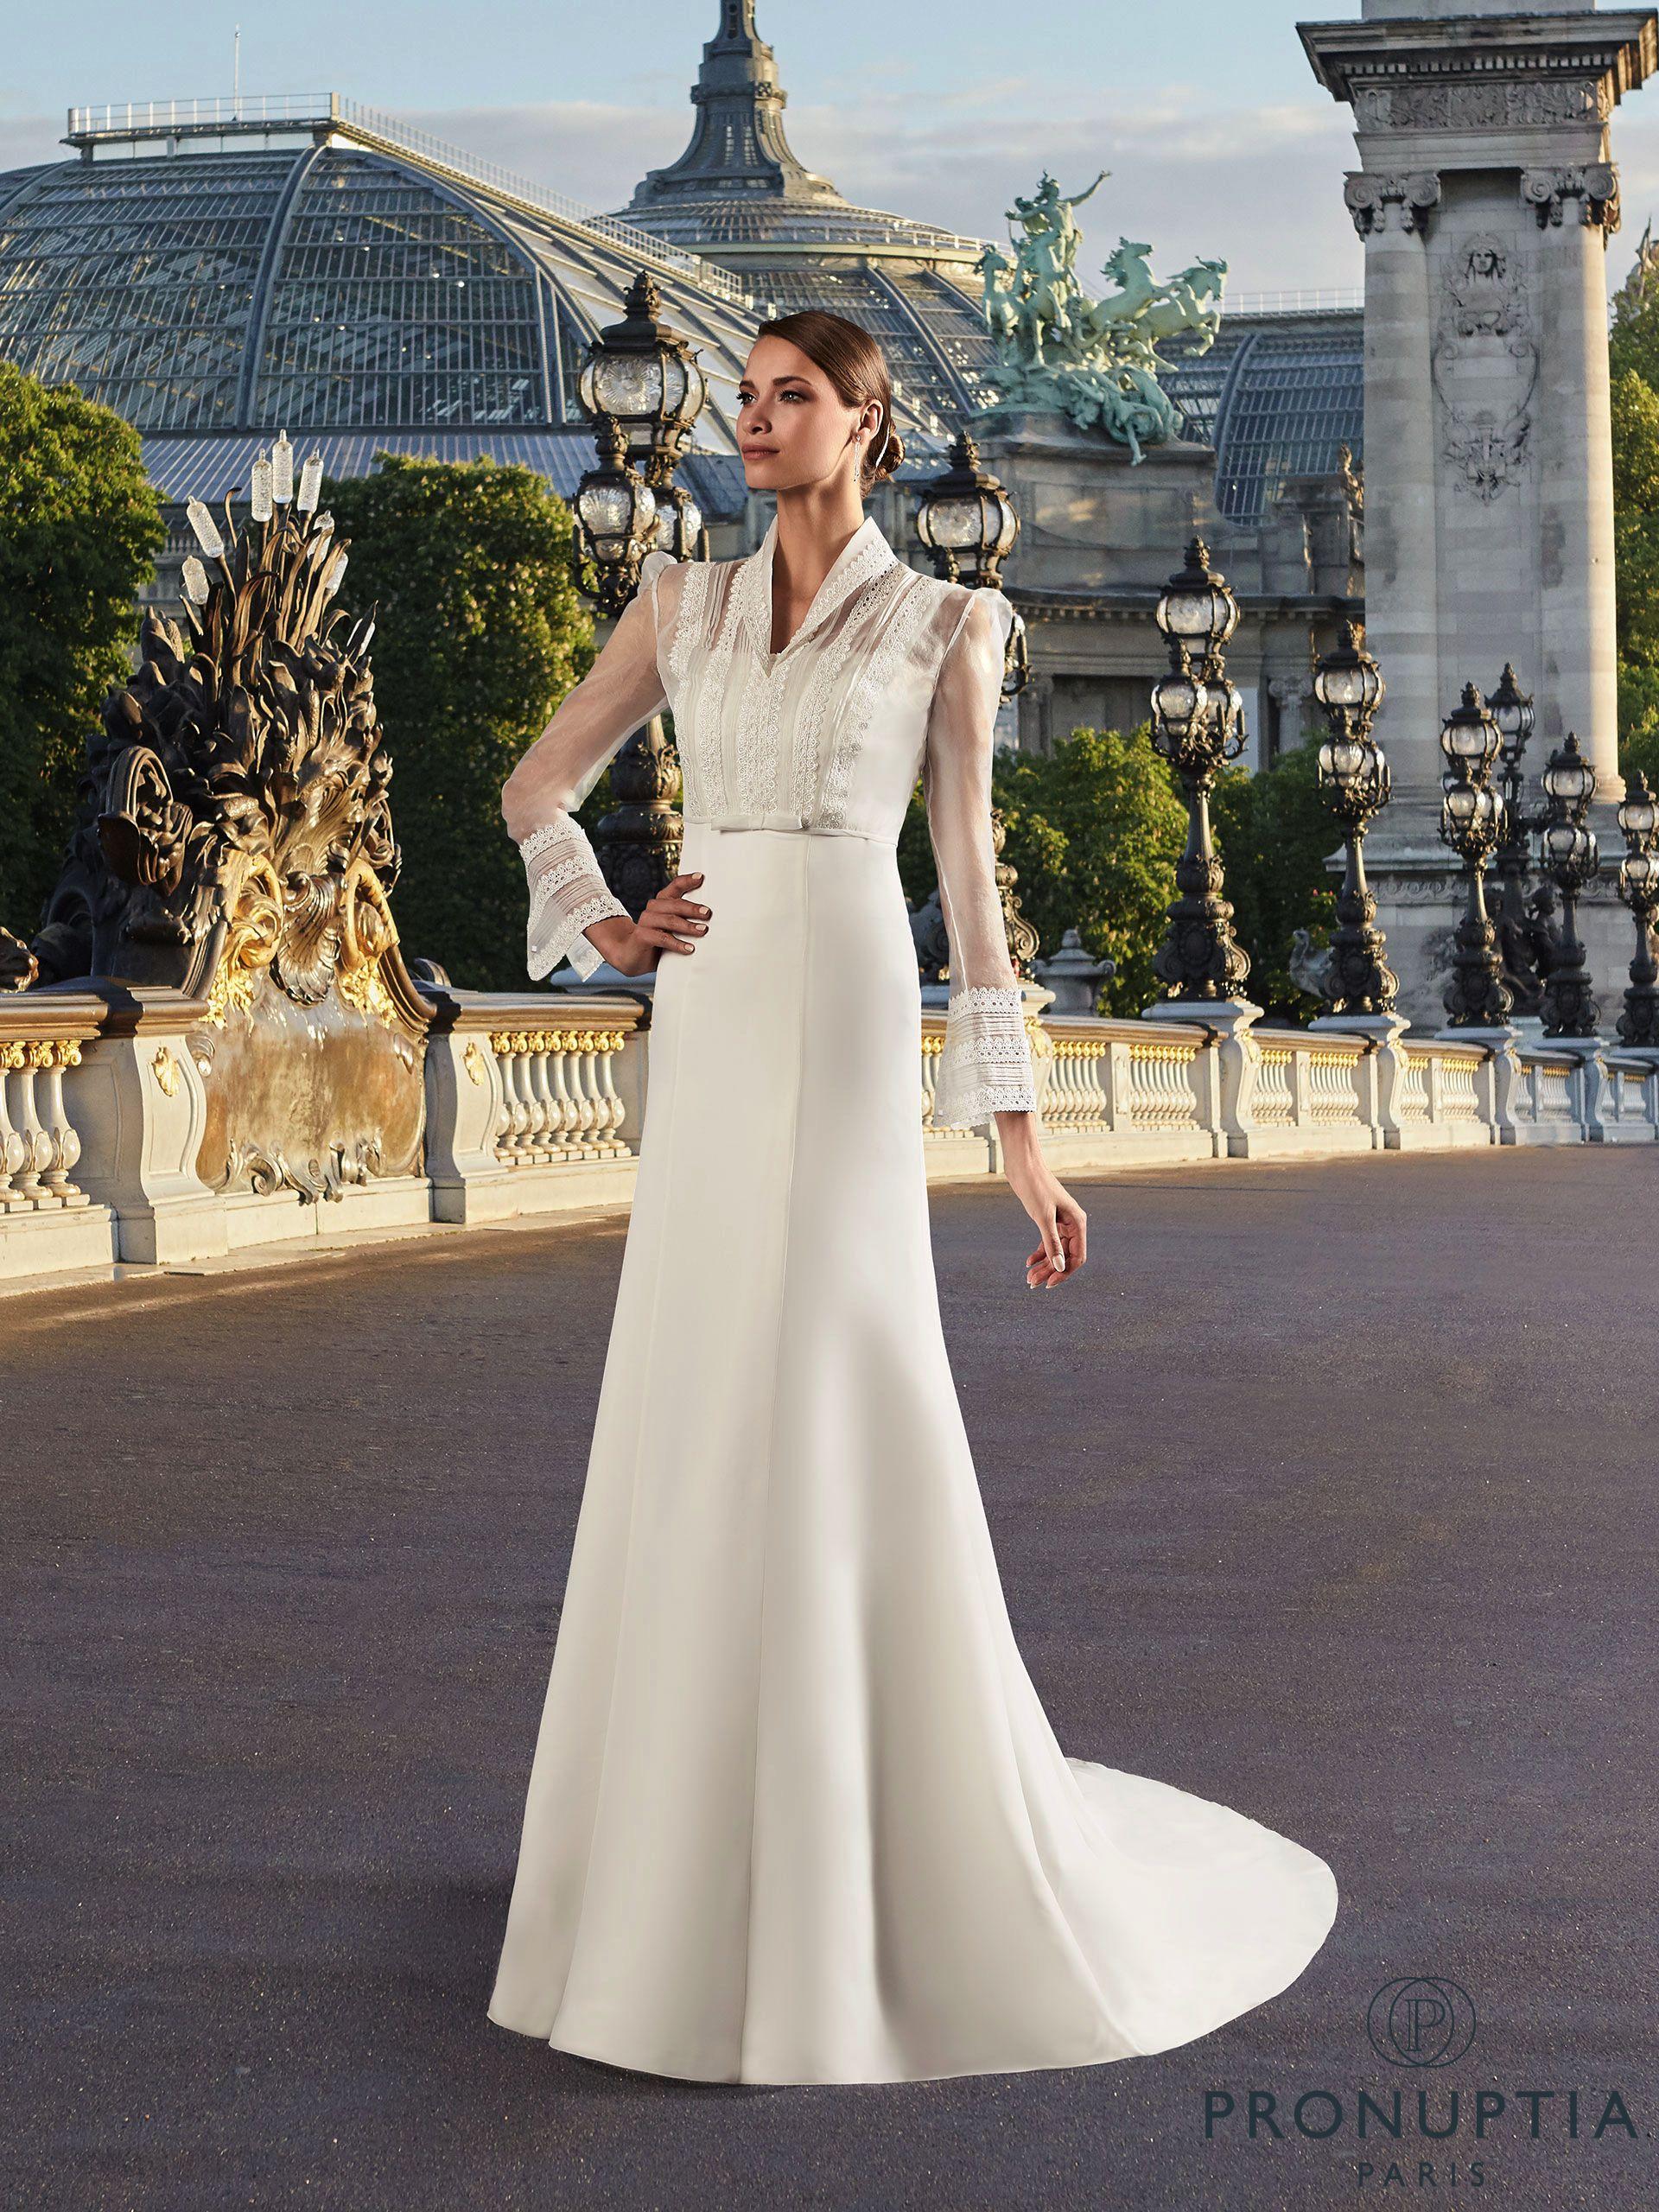 Robe de mariée eylau robe de mariée chemisier robe de mariée chic